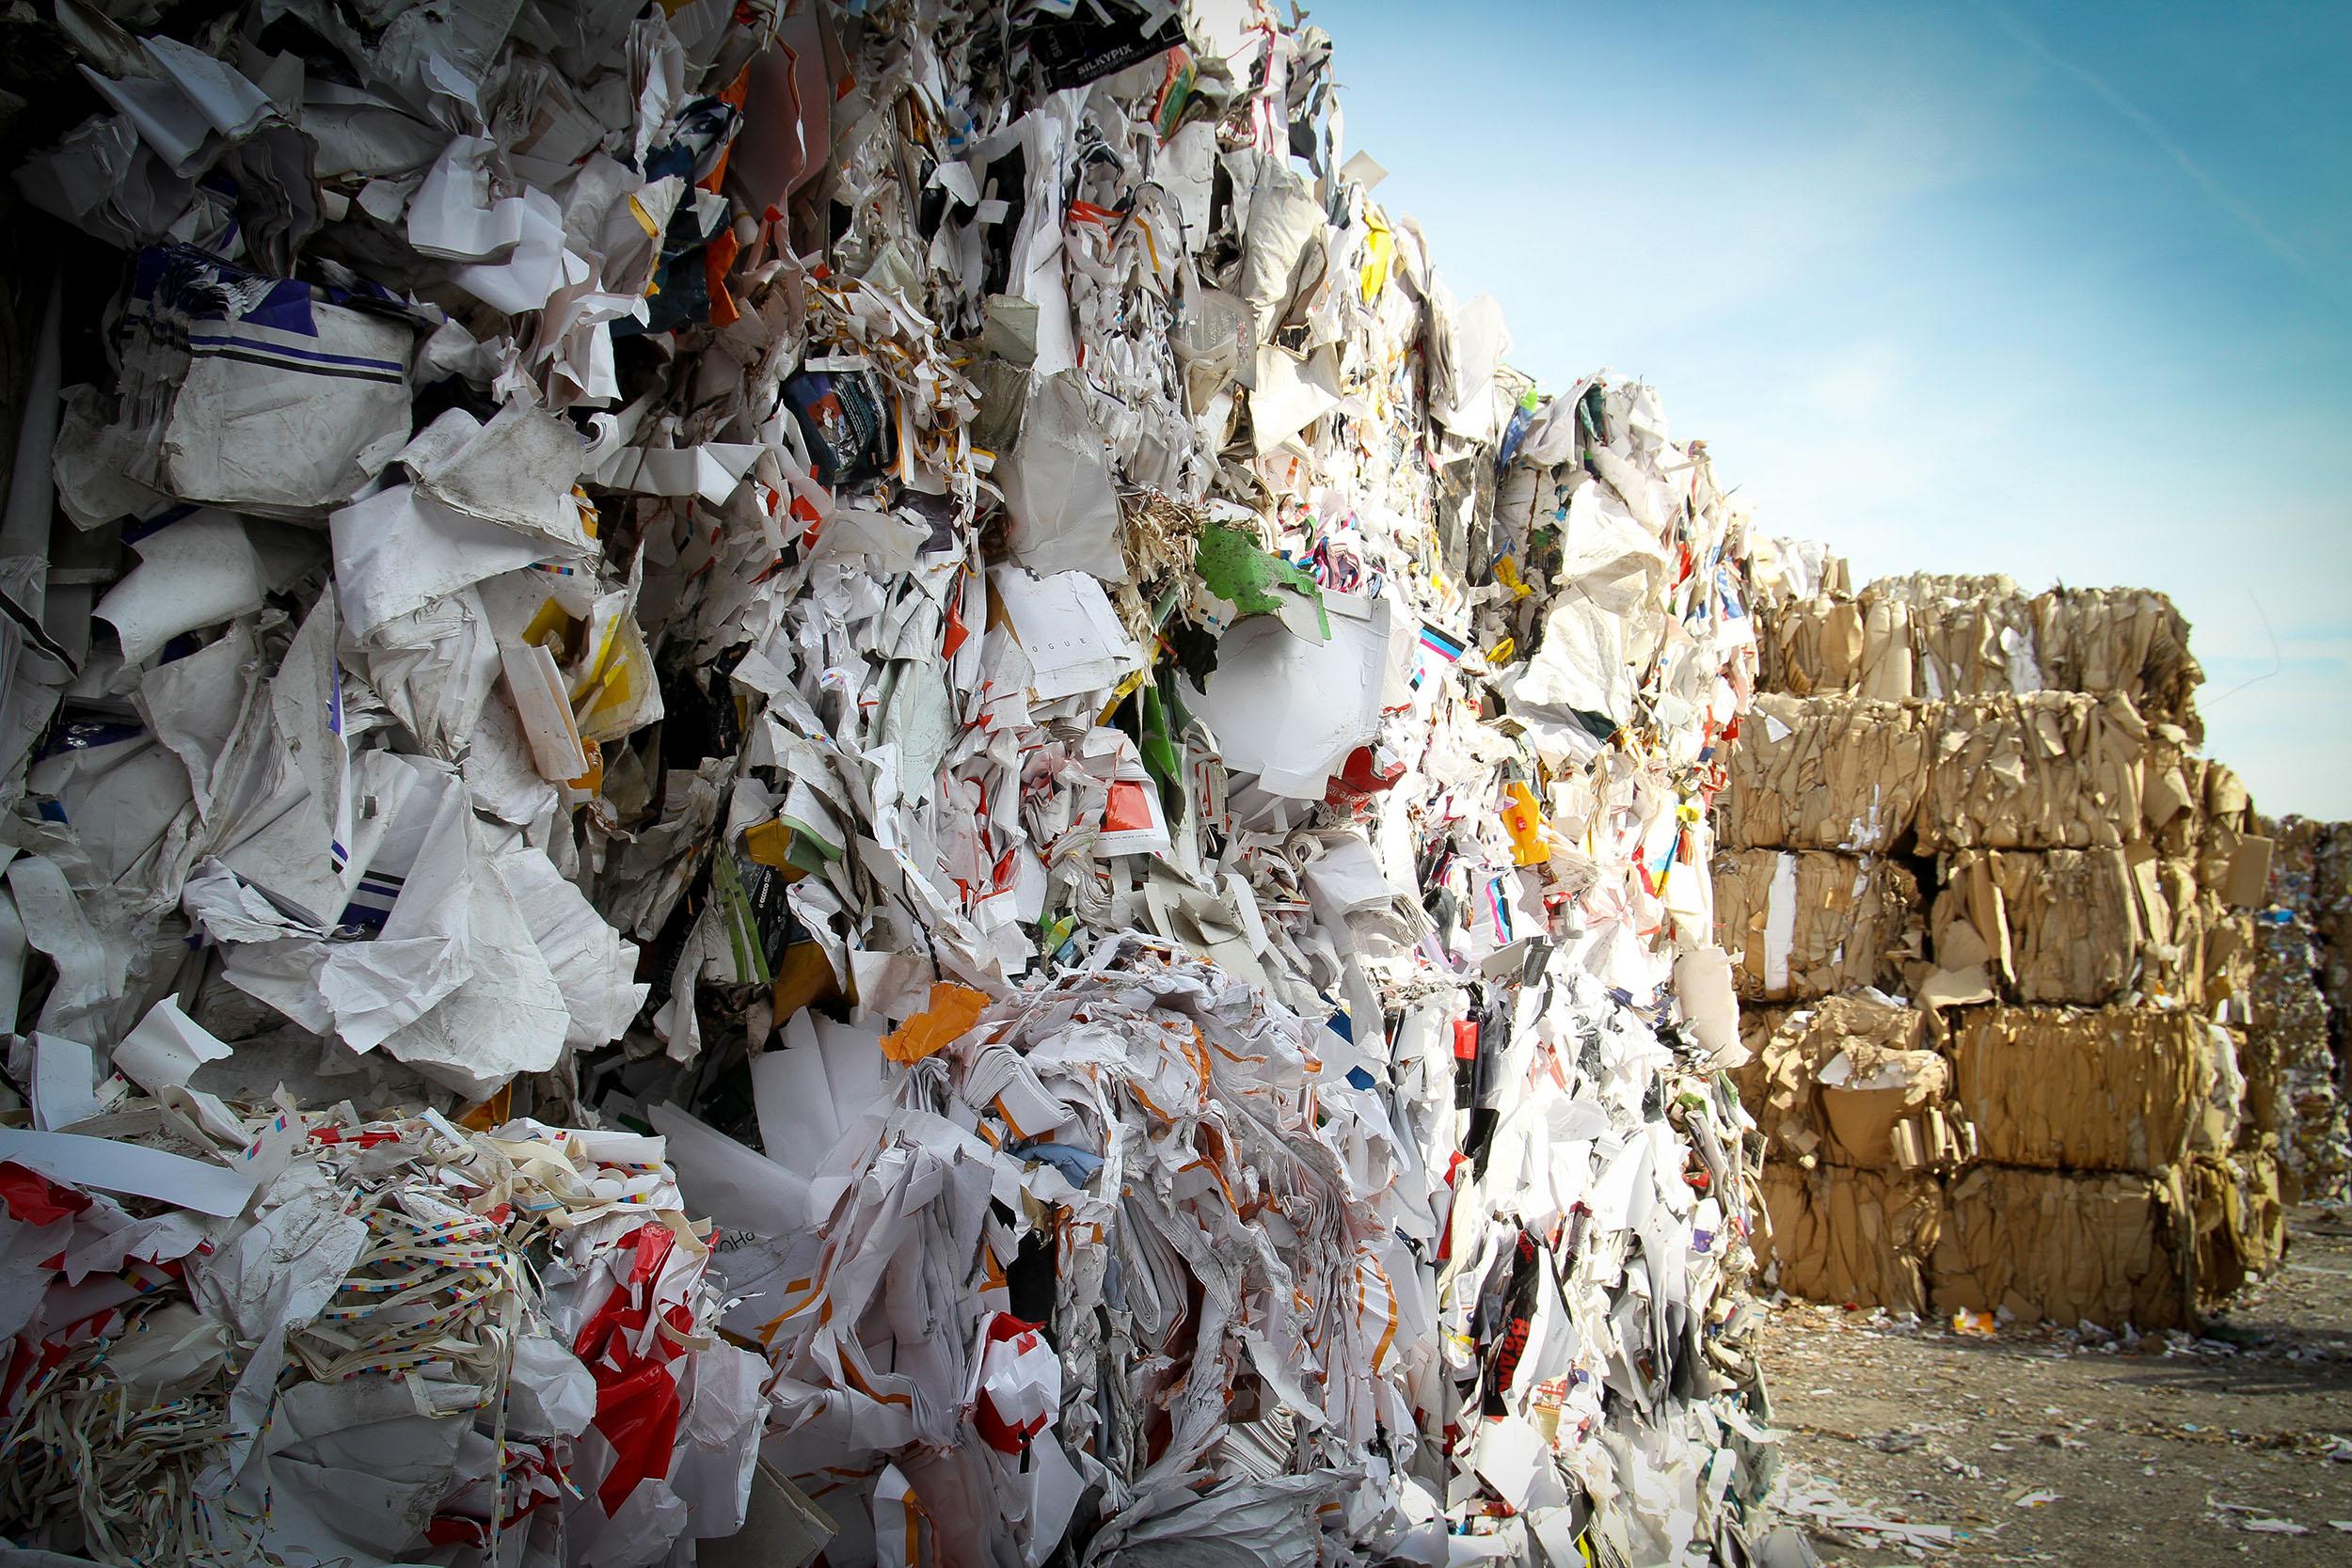 Unboxed-Market-Waste-Paper-Pollution.jpg